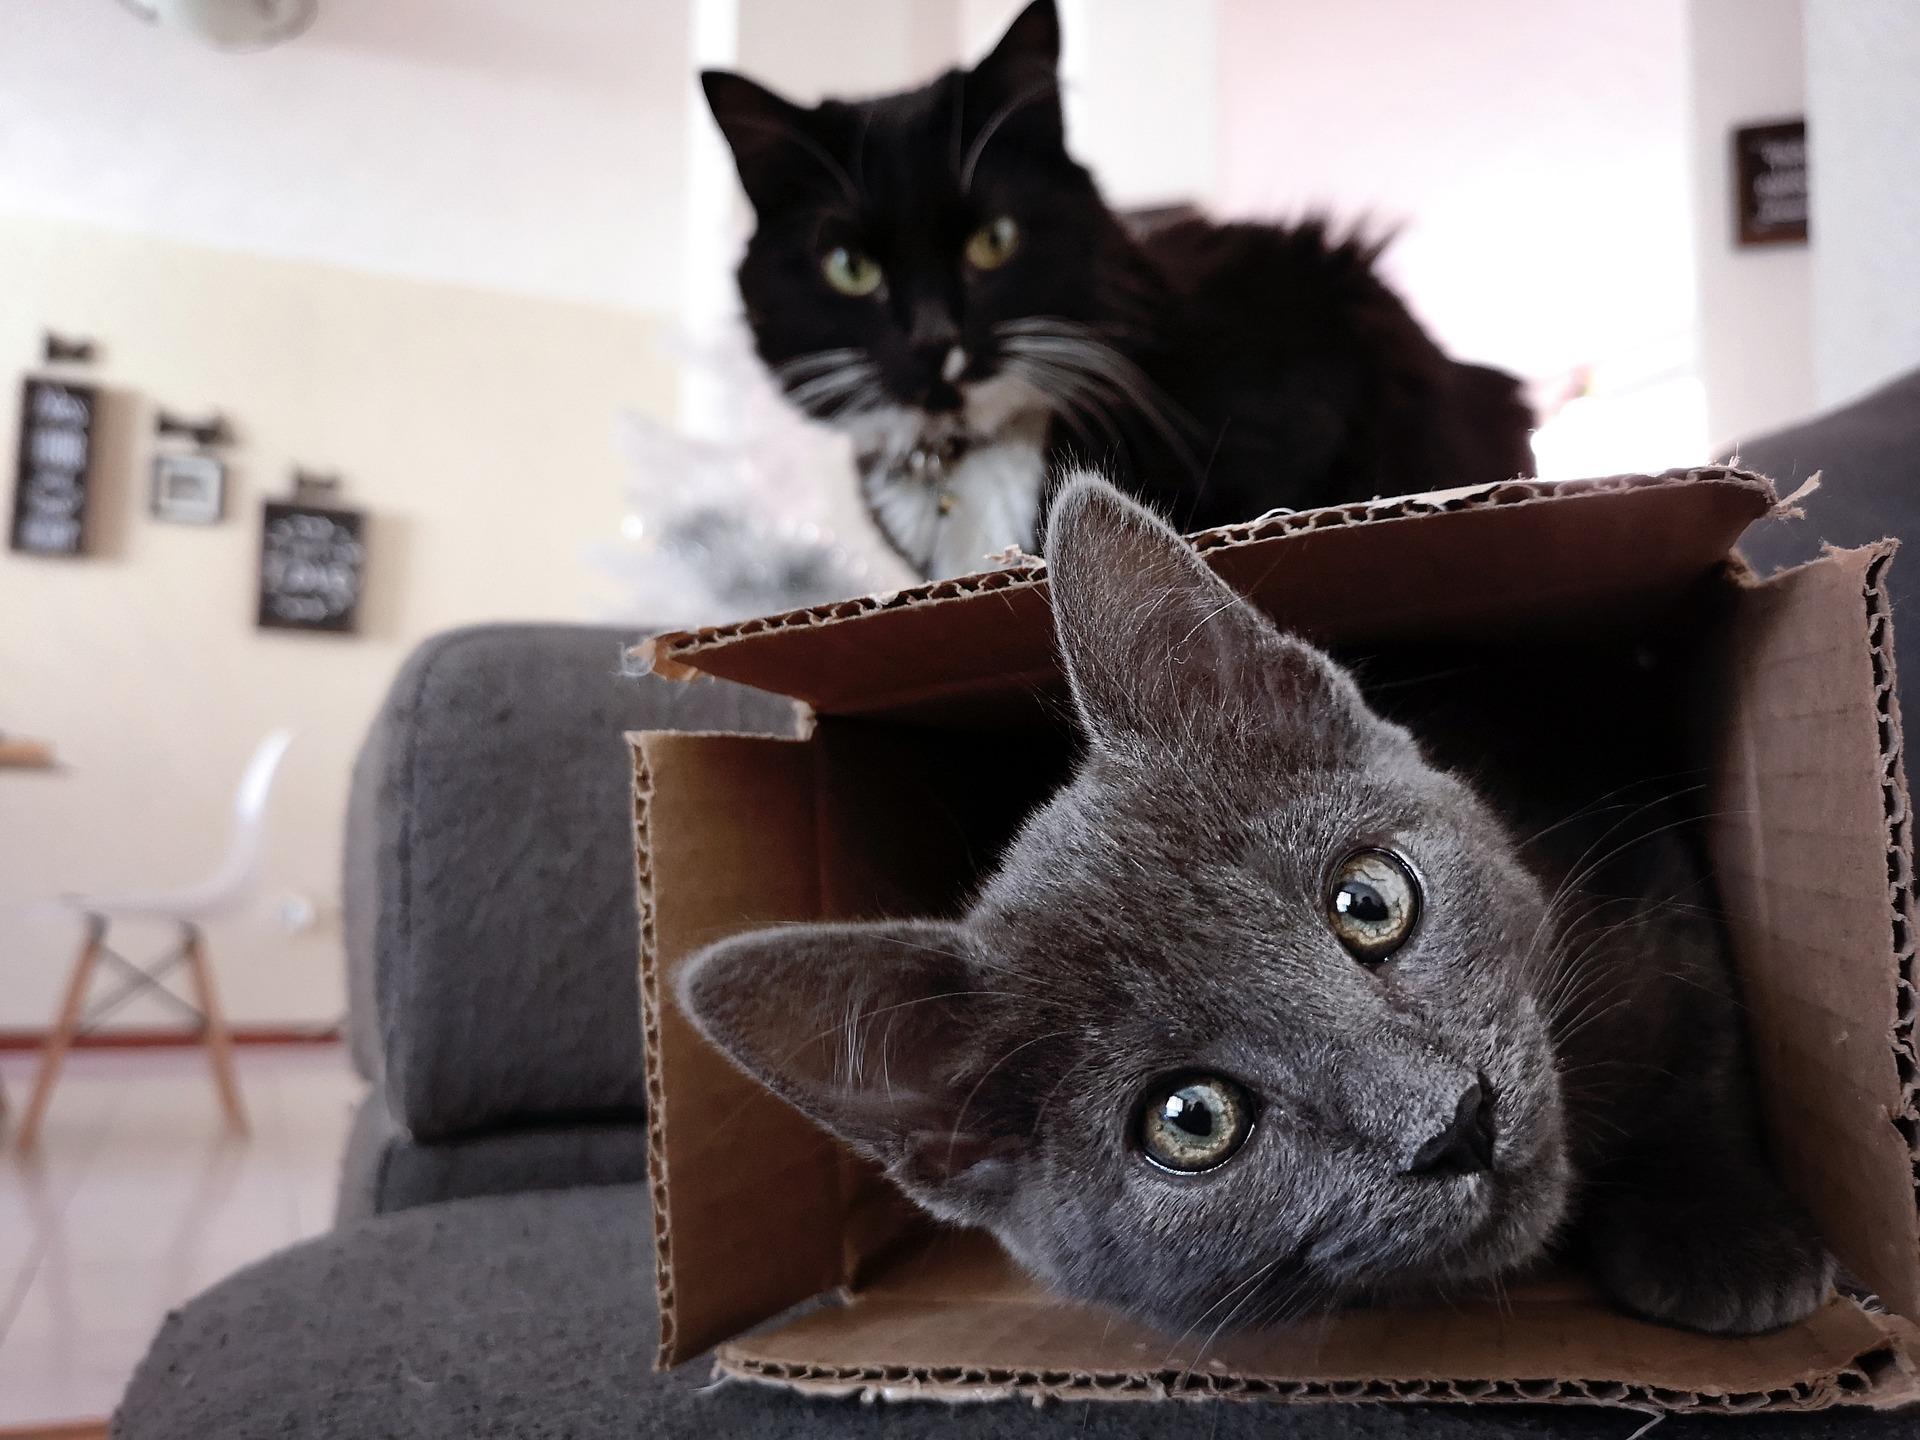 cats-3971069_1920